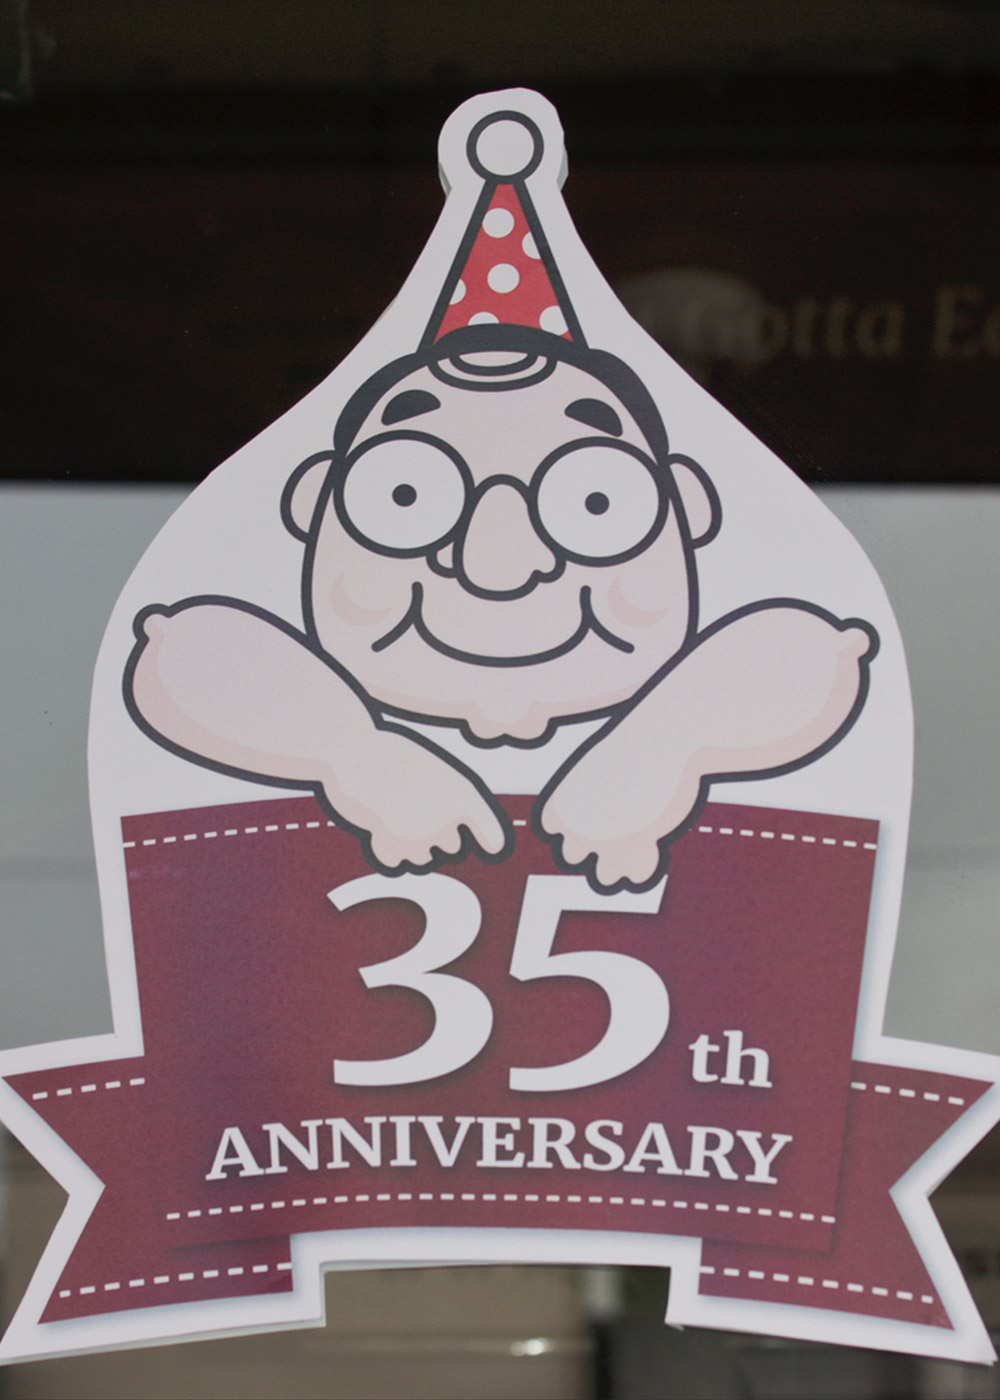 neighbours-restaurant-35th-anniversary-41.jpg